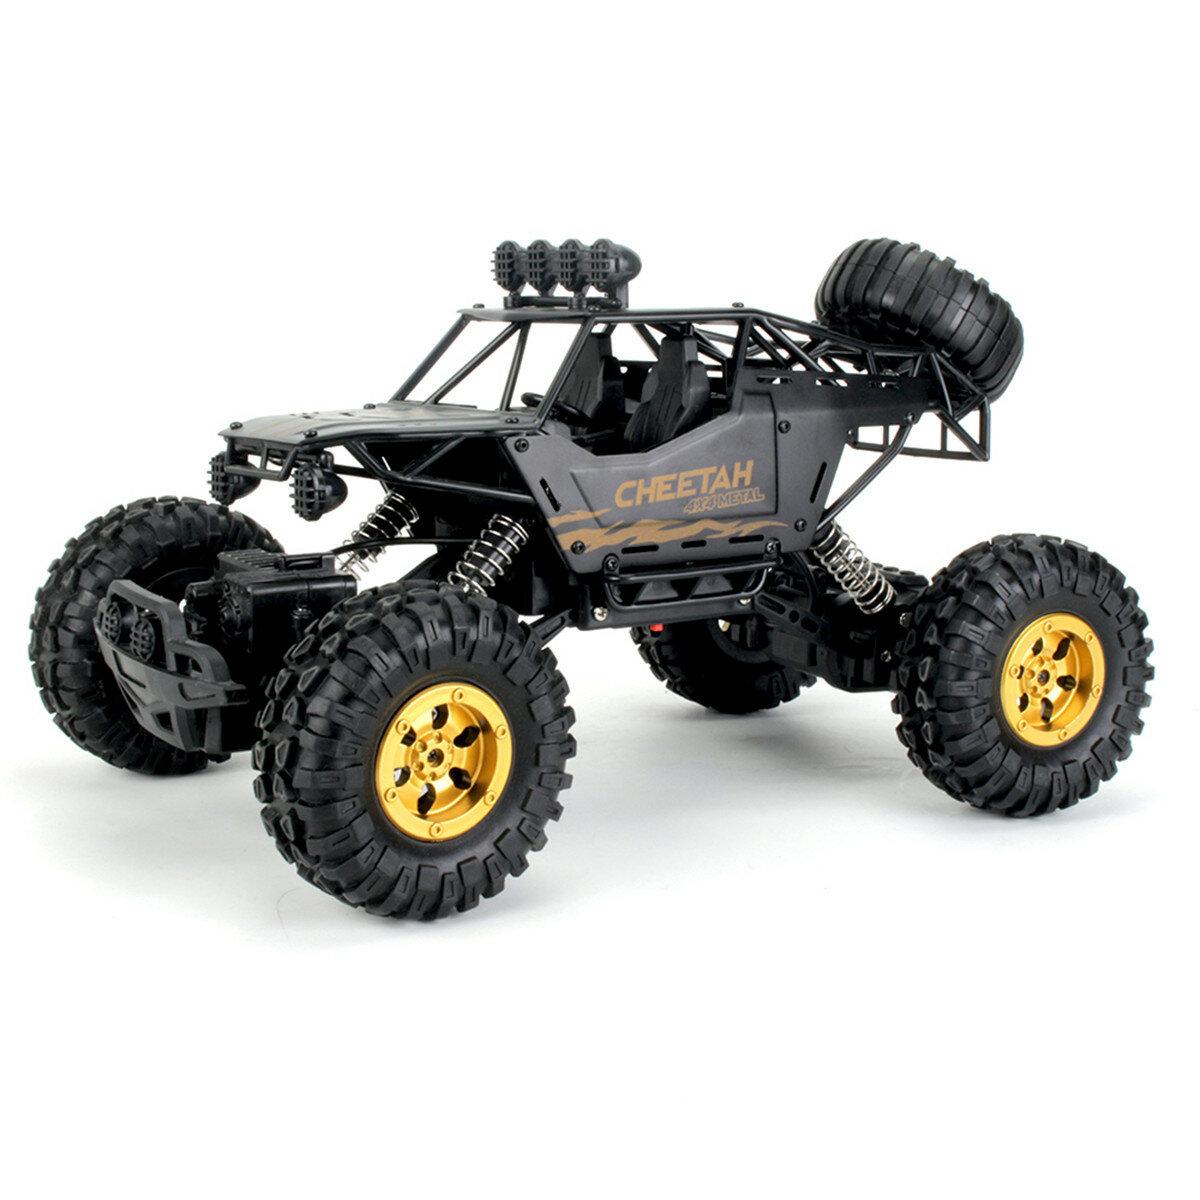 KYAMRC 1/12 2.4G 4WD RC Car Crawler Metal Body Vehicle Models Truck Indoor Outdoor Toys